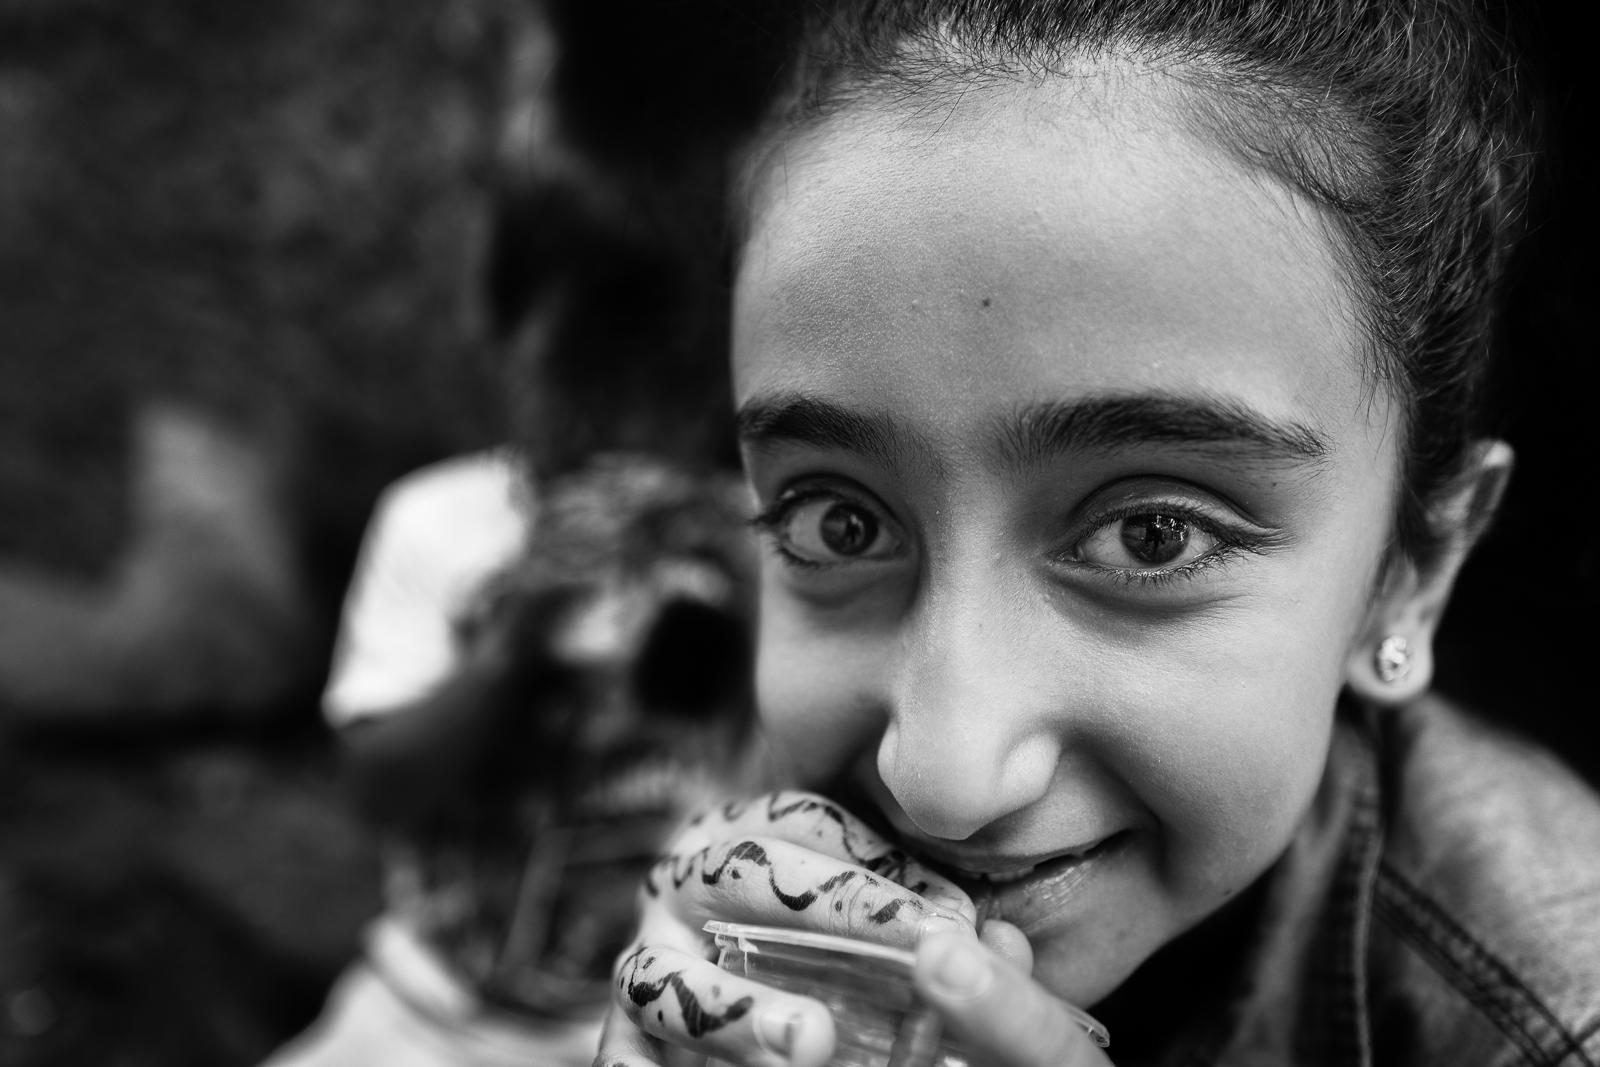 Little kurdish girl is drinking in Diyarbakir, Turkey